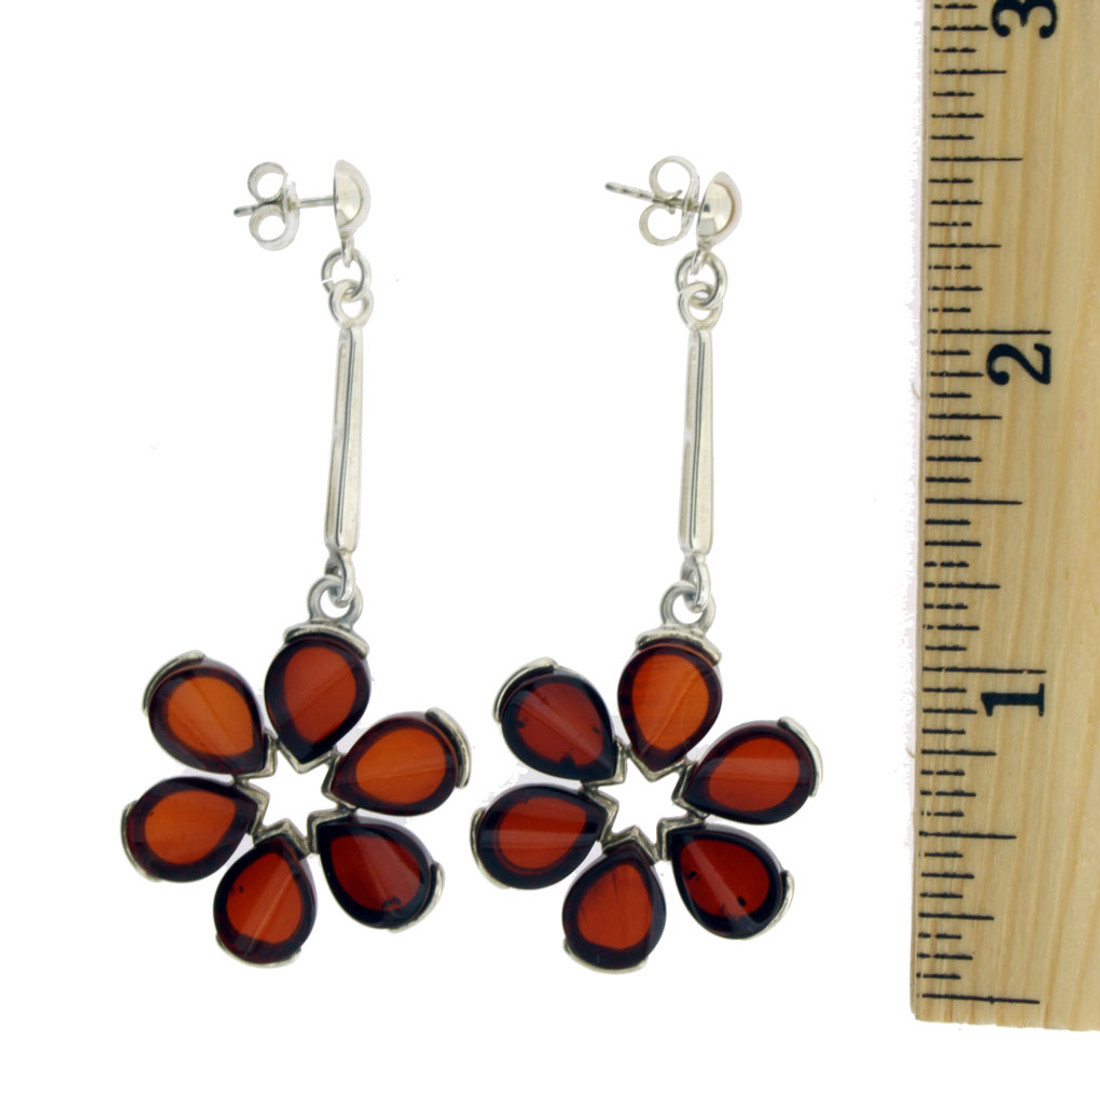 Amber Flower Dangle Earrings Sterling Silver